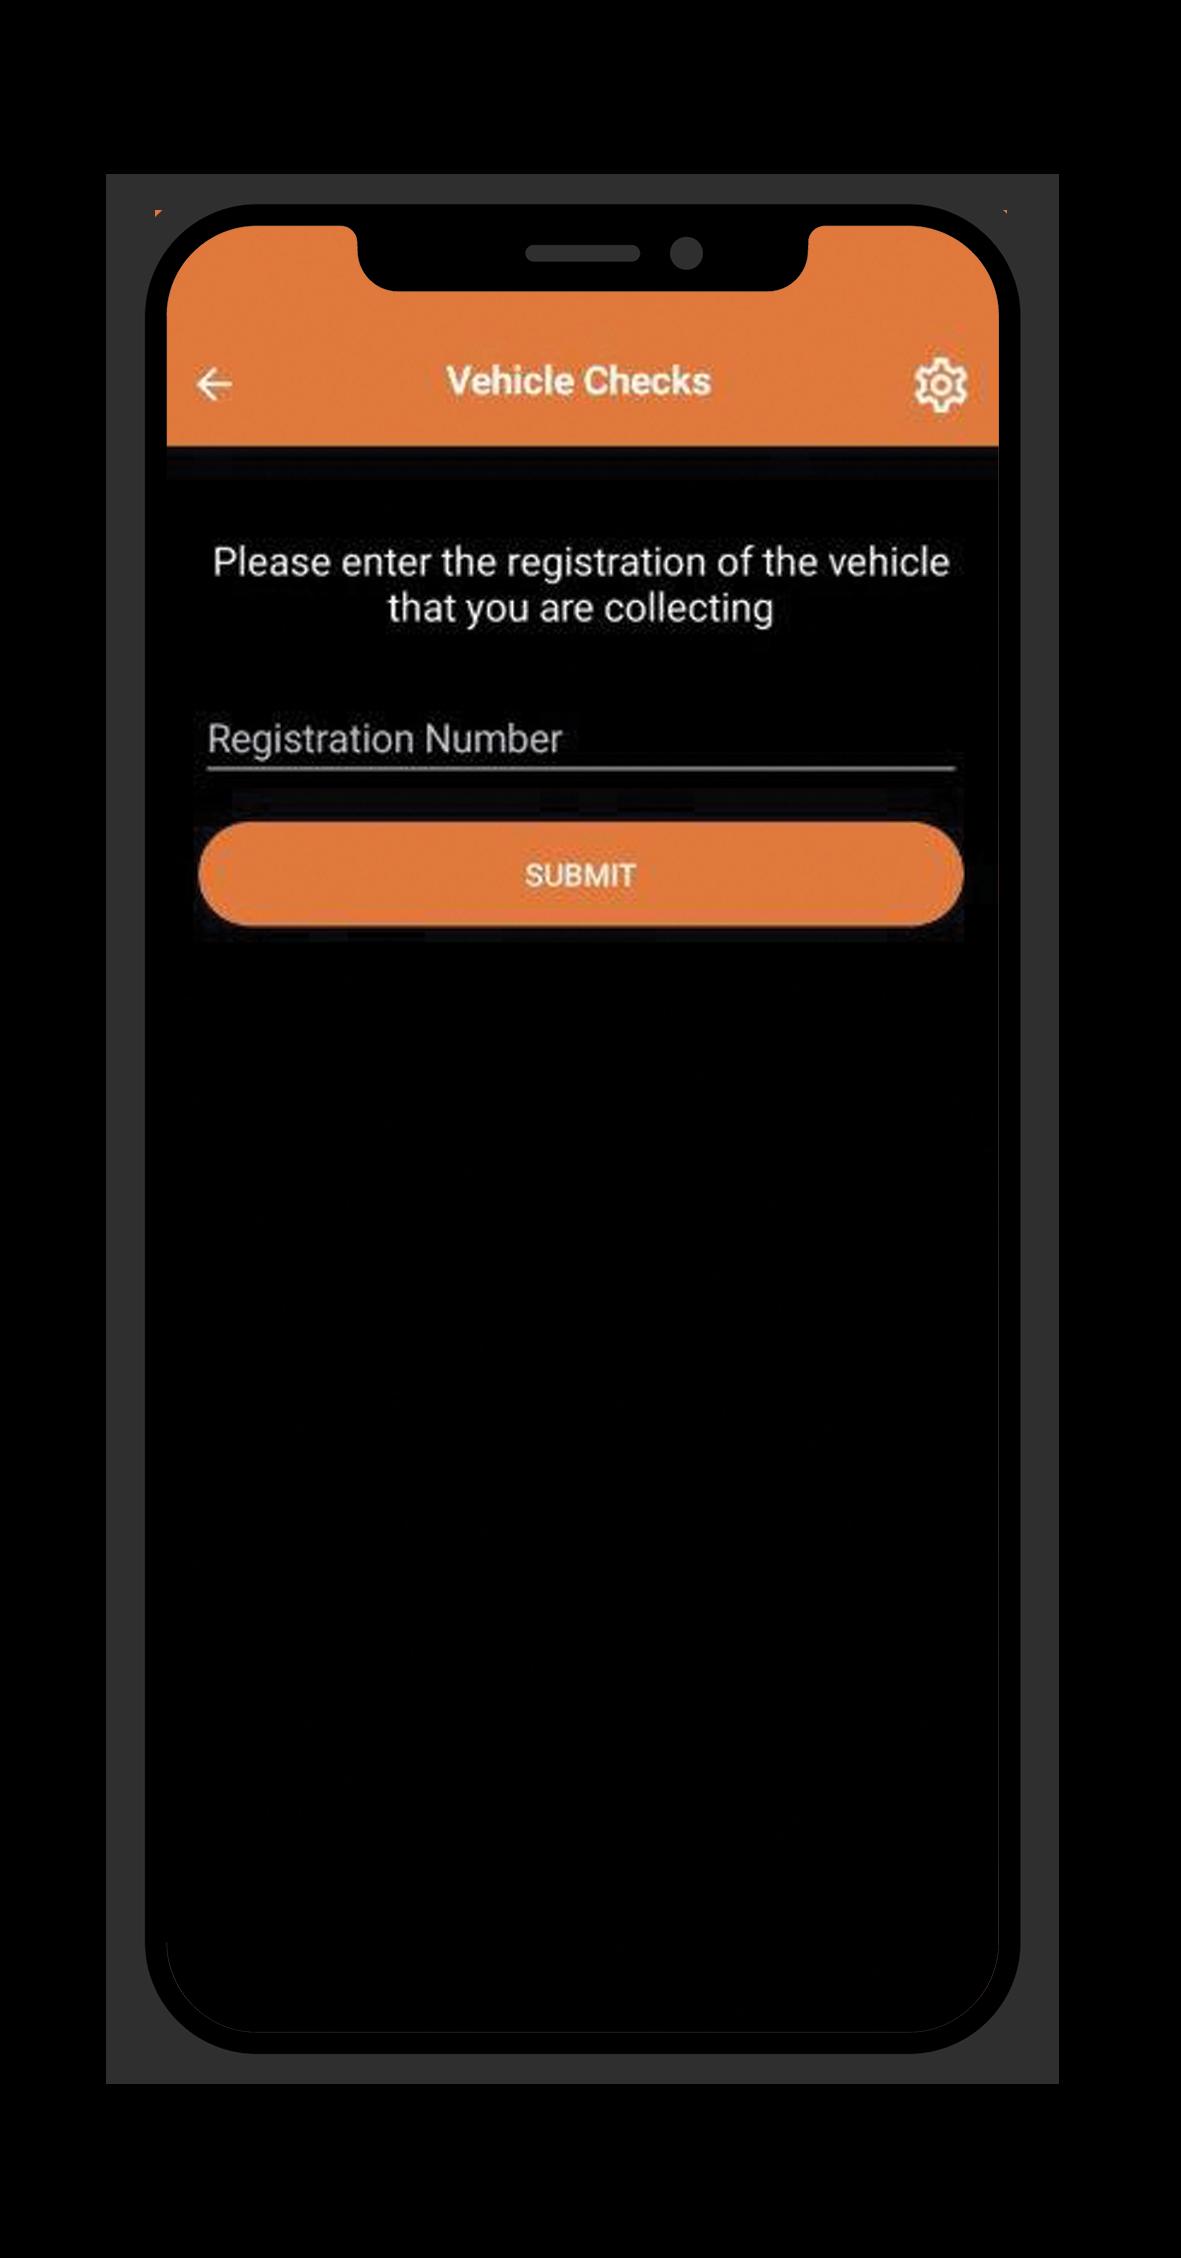 Checking new/returned vehicles